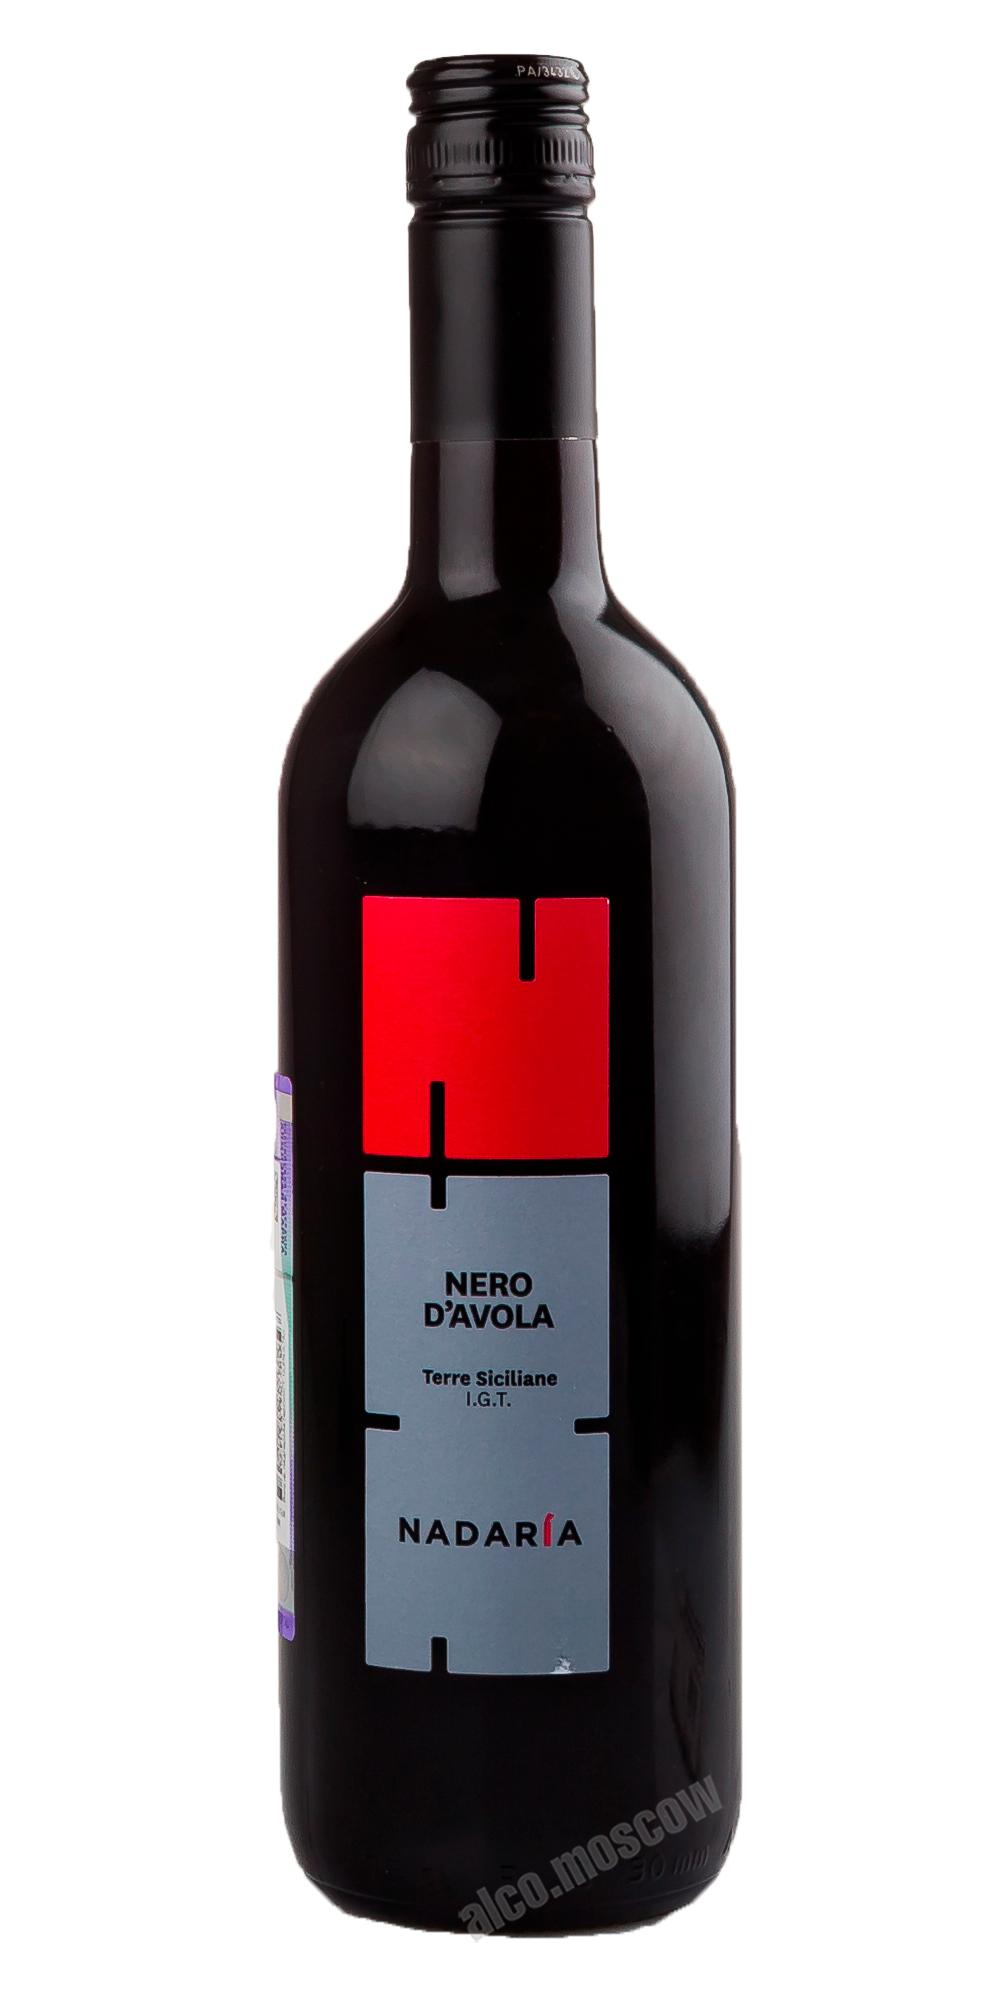 Cusumano Cusumano Nadaria Nero Davola IGT Итальянское вино дАвола Терре Сичилиане ИГТ